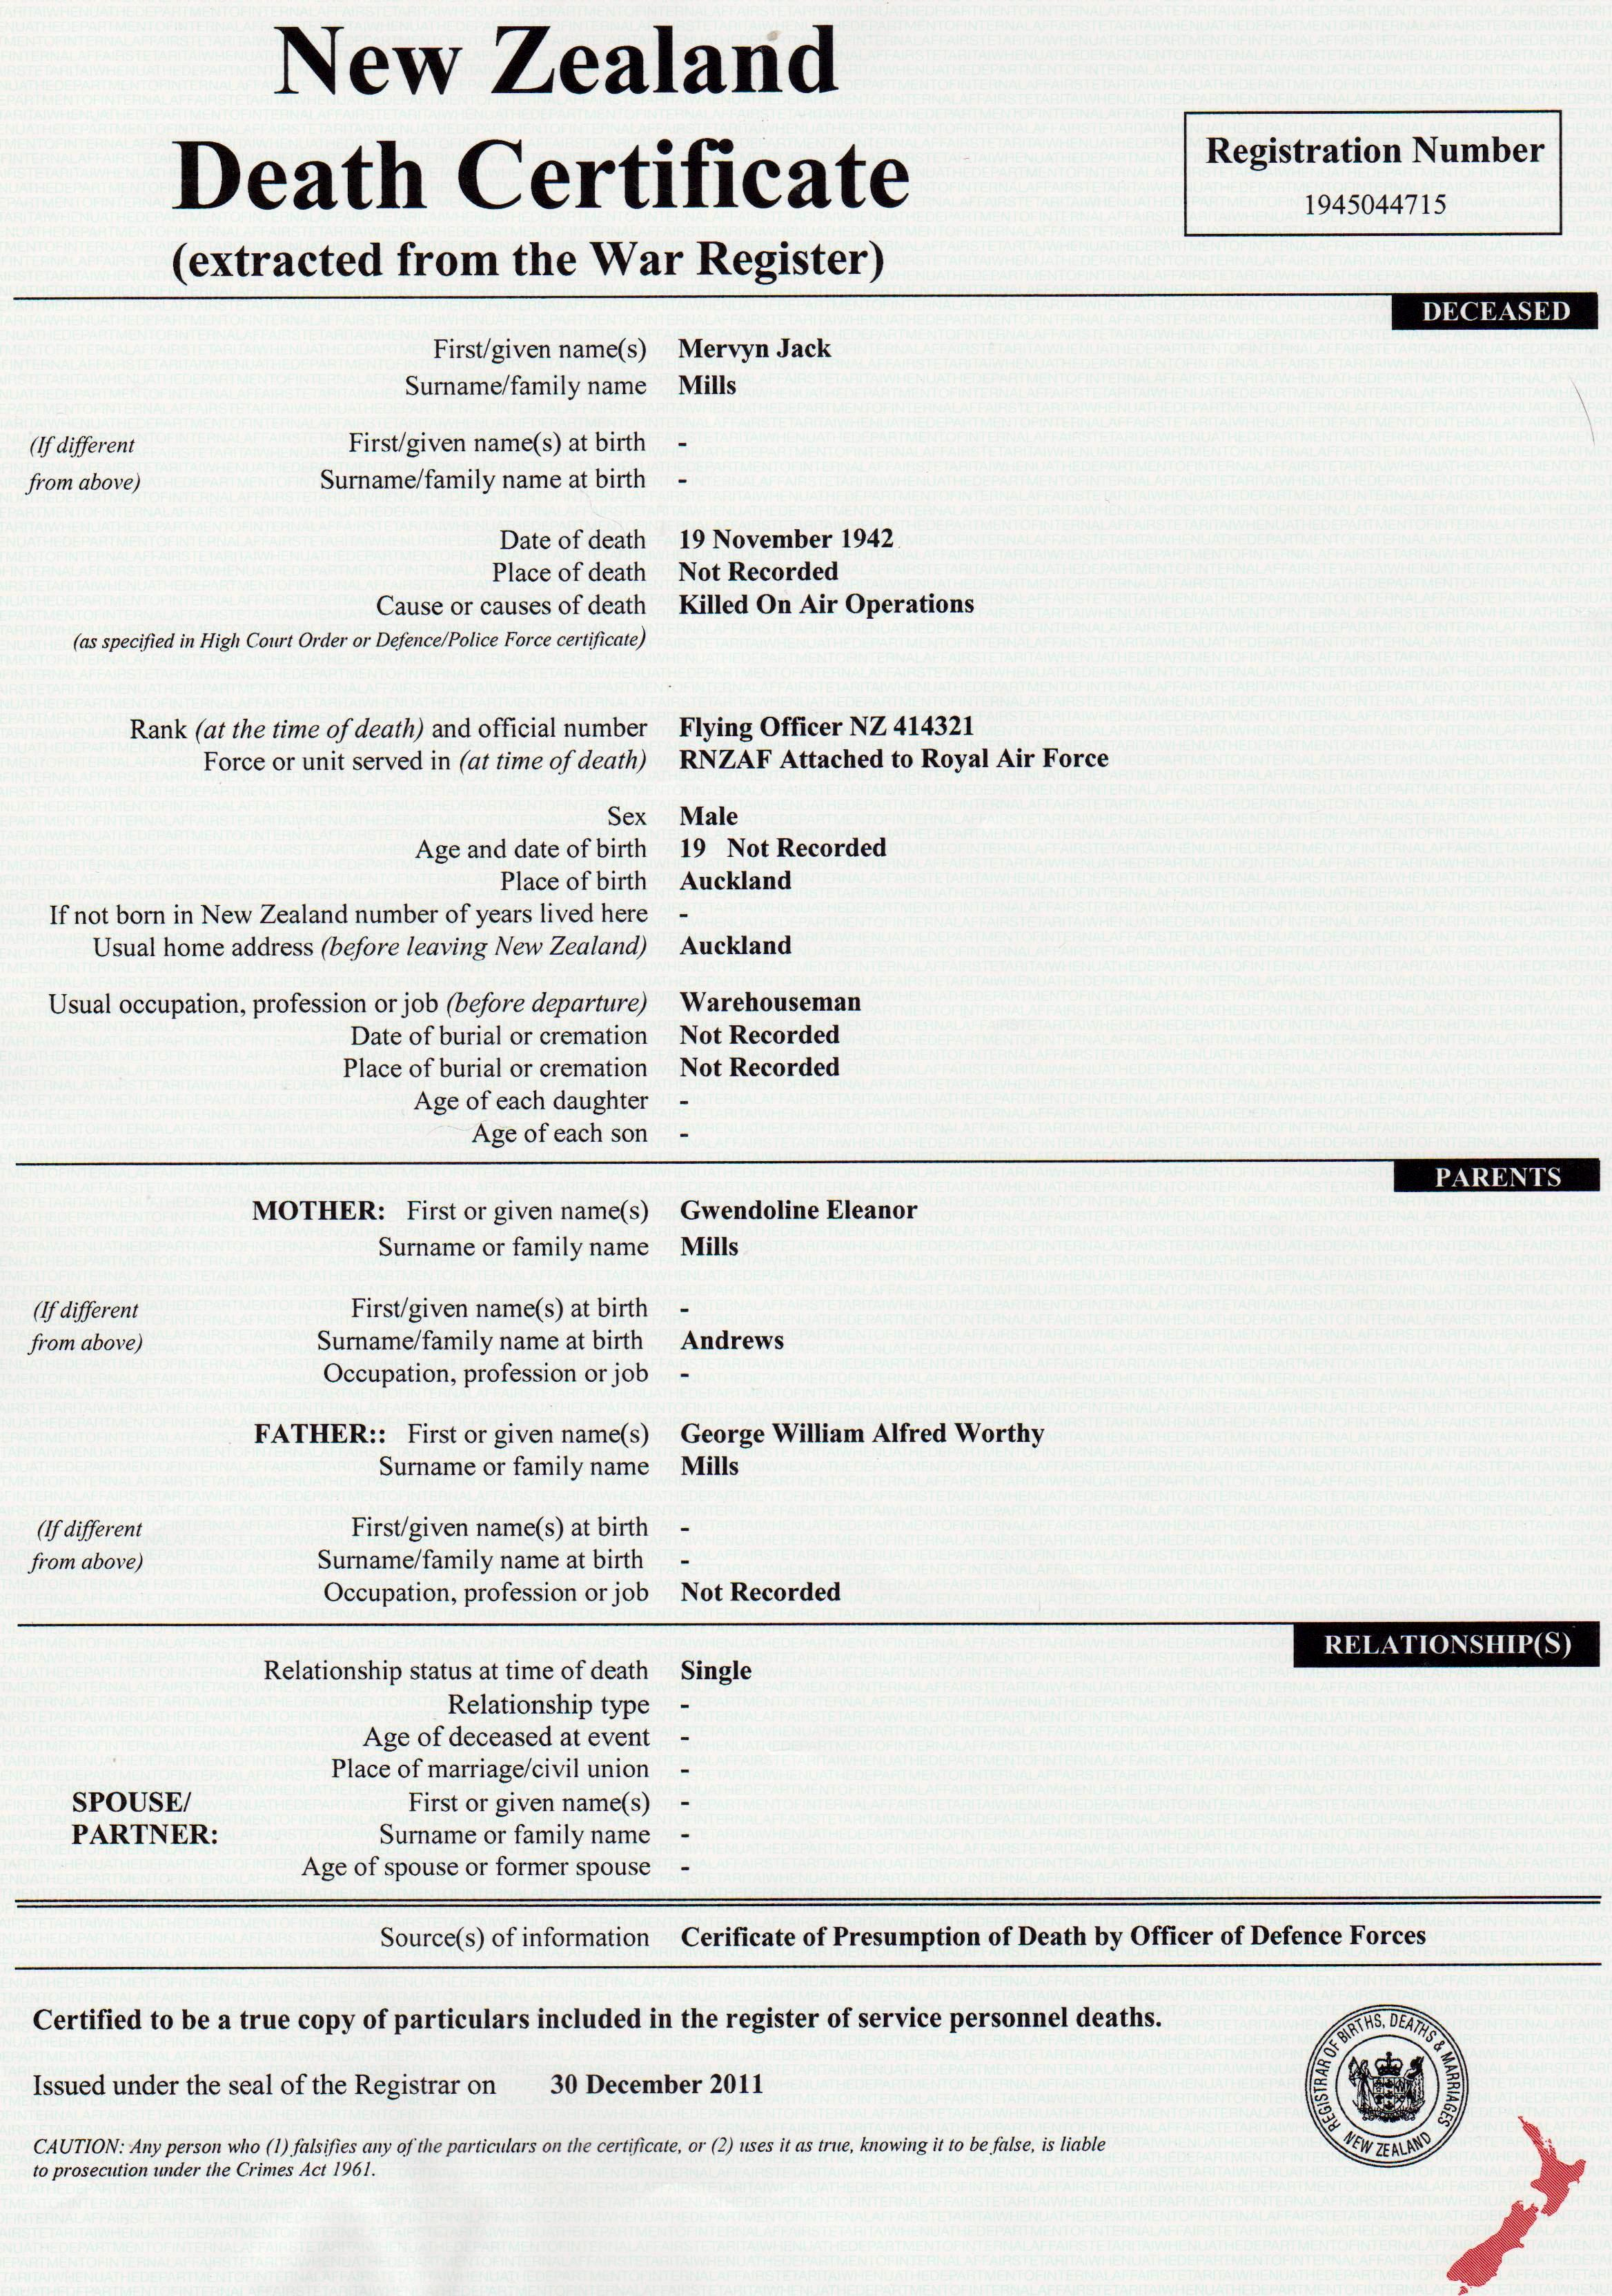 Death certificate of mj mills british commonwealth air training plan death certificate of mj mills aiddatafo Images